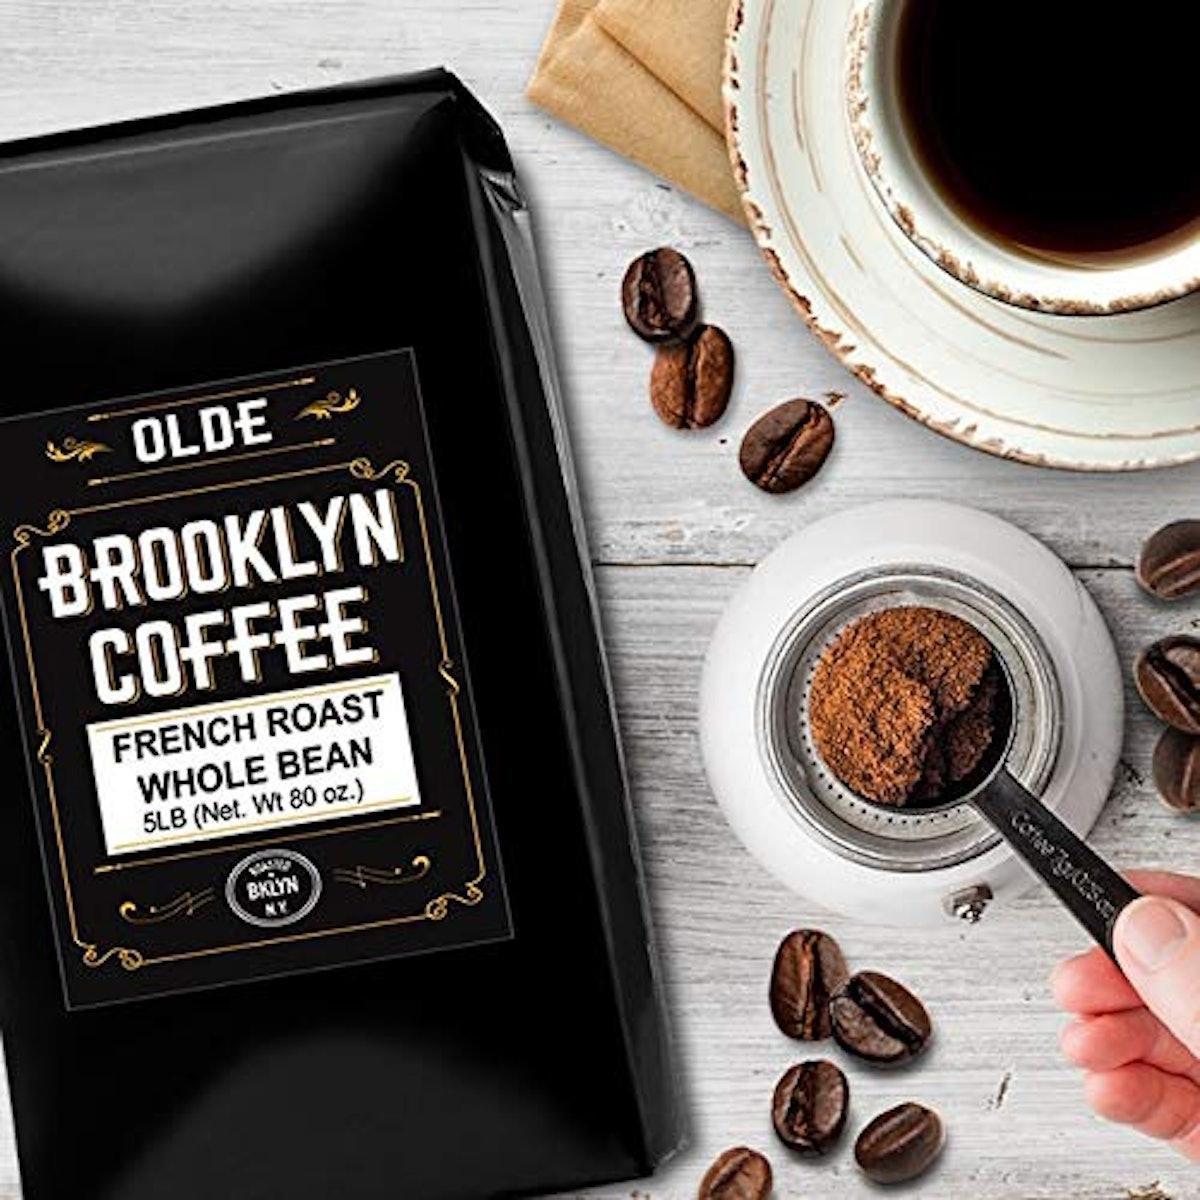 FRENCH ROAST Whole Bean Coffee (5-Pound Bag)